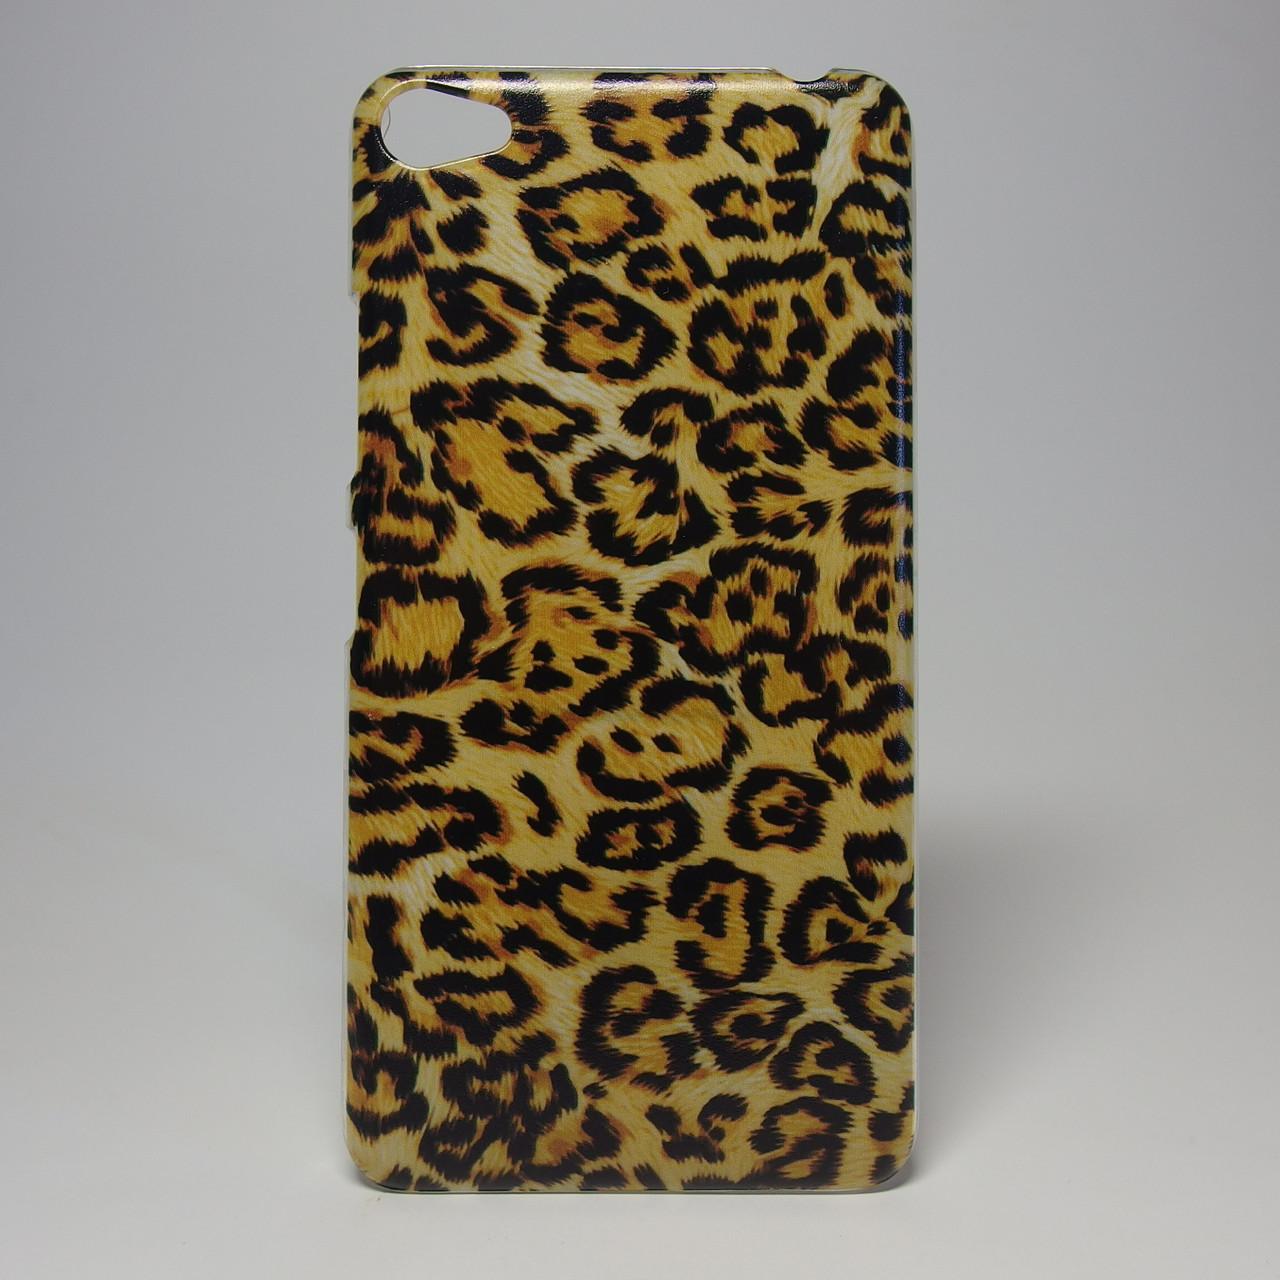 Чехол для lenovo s60 панель накладка с рисунком леопард